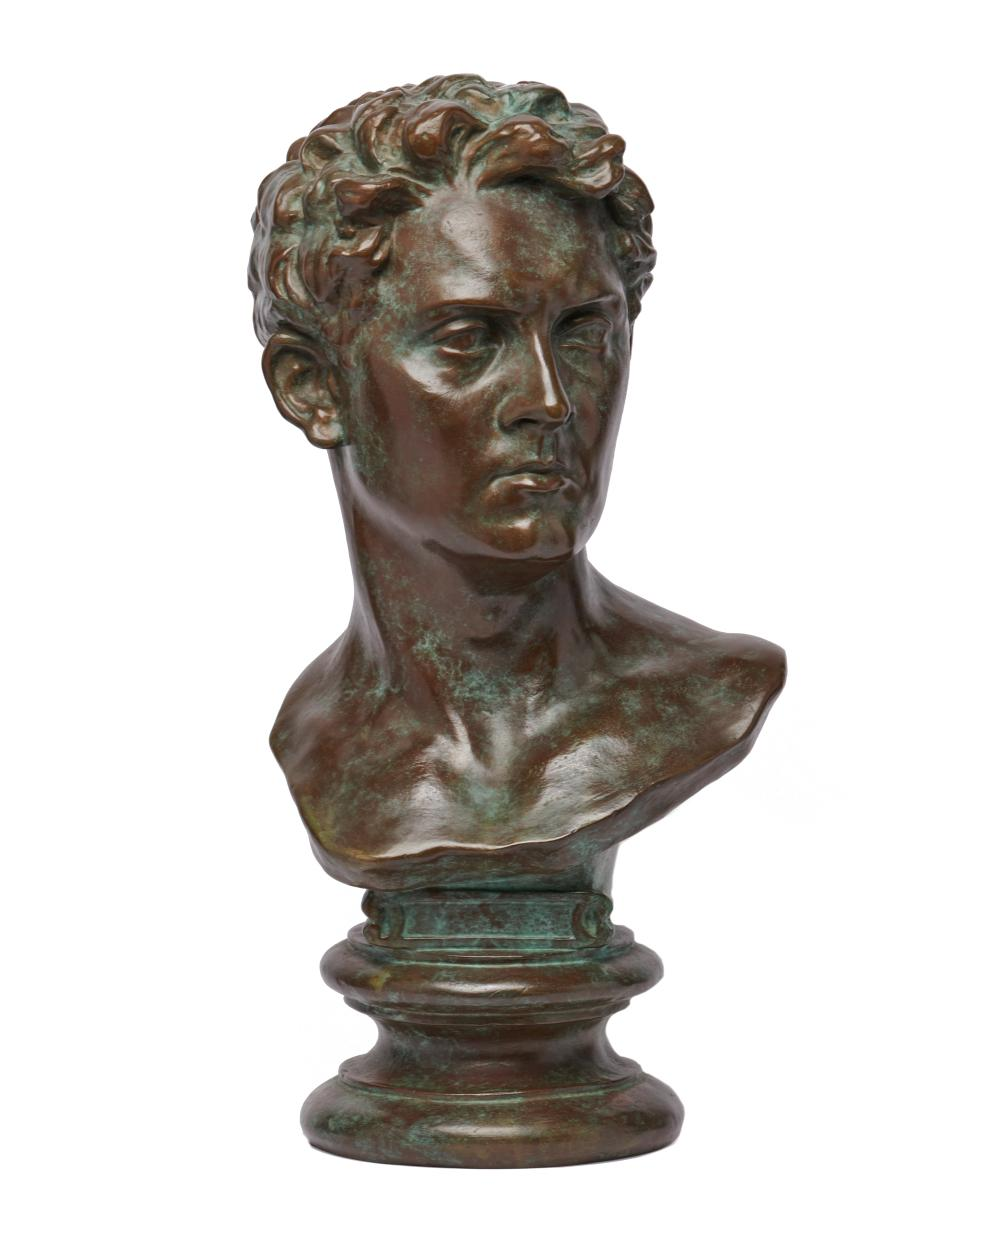 OLIN LEVI WARNER, (American, 1844-1896), Julian Alden Weir, 1880, bronze, height: 22 in.